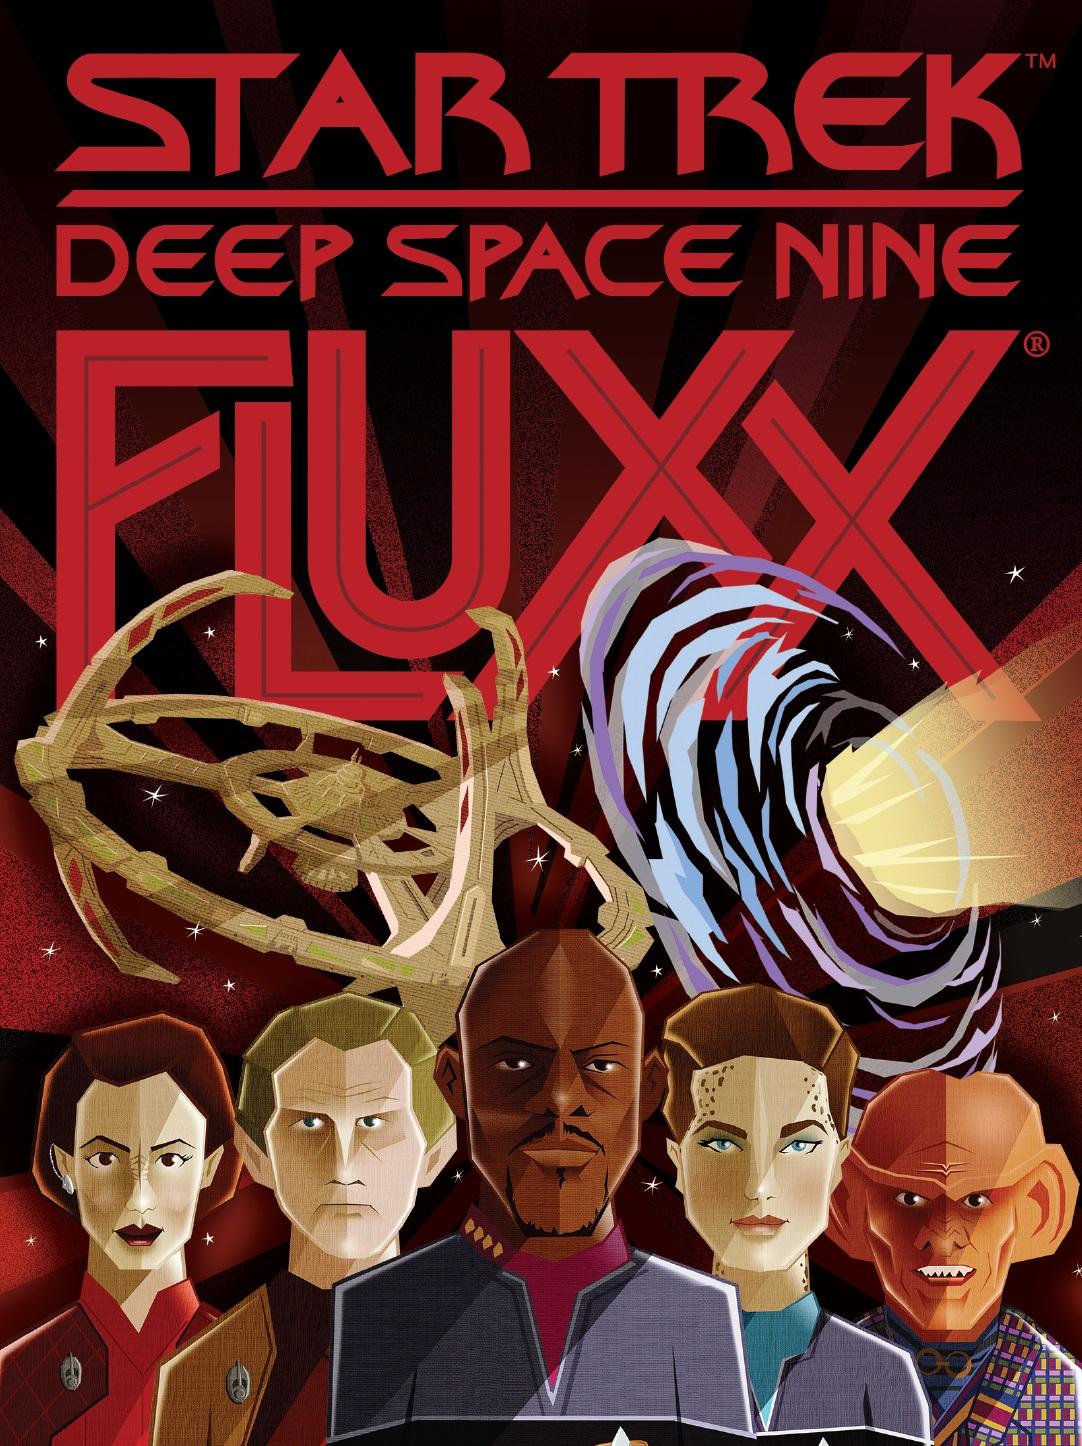 Star Trek: Deep Space Nine Fluxx (display 6) Game Box